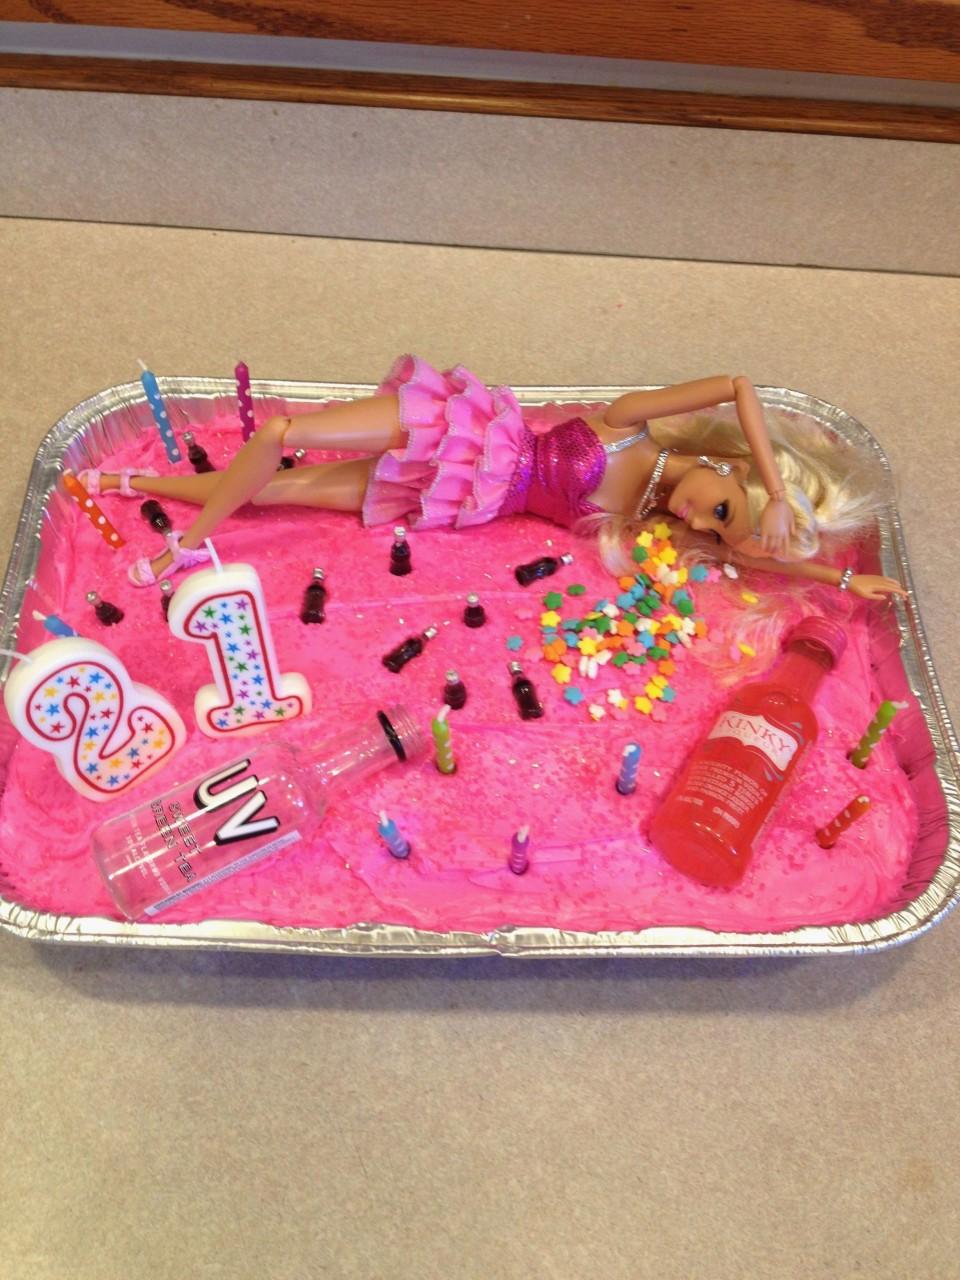 Sensational Barbie 21St Birthday Cake New Beautiful Wallpaper For 21 Girl Funny Birthday Cards Online Alyptdamsfinfo